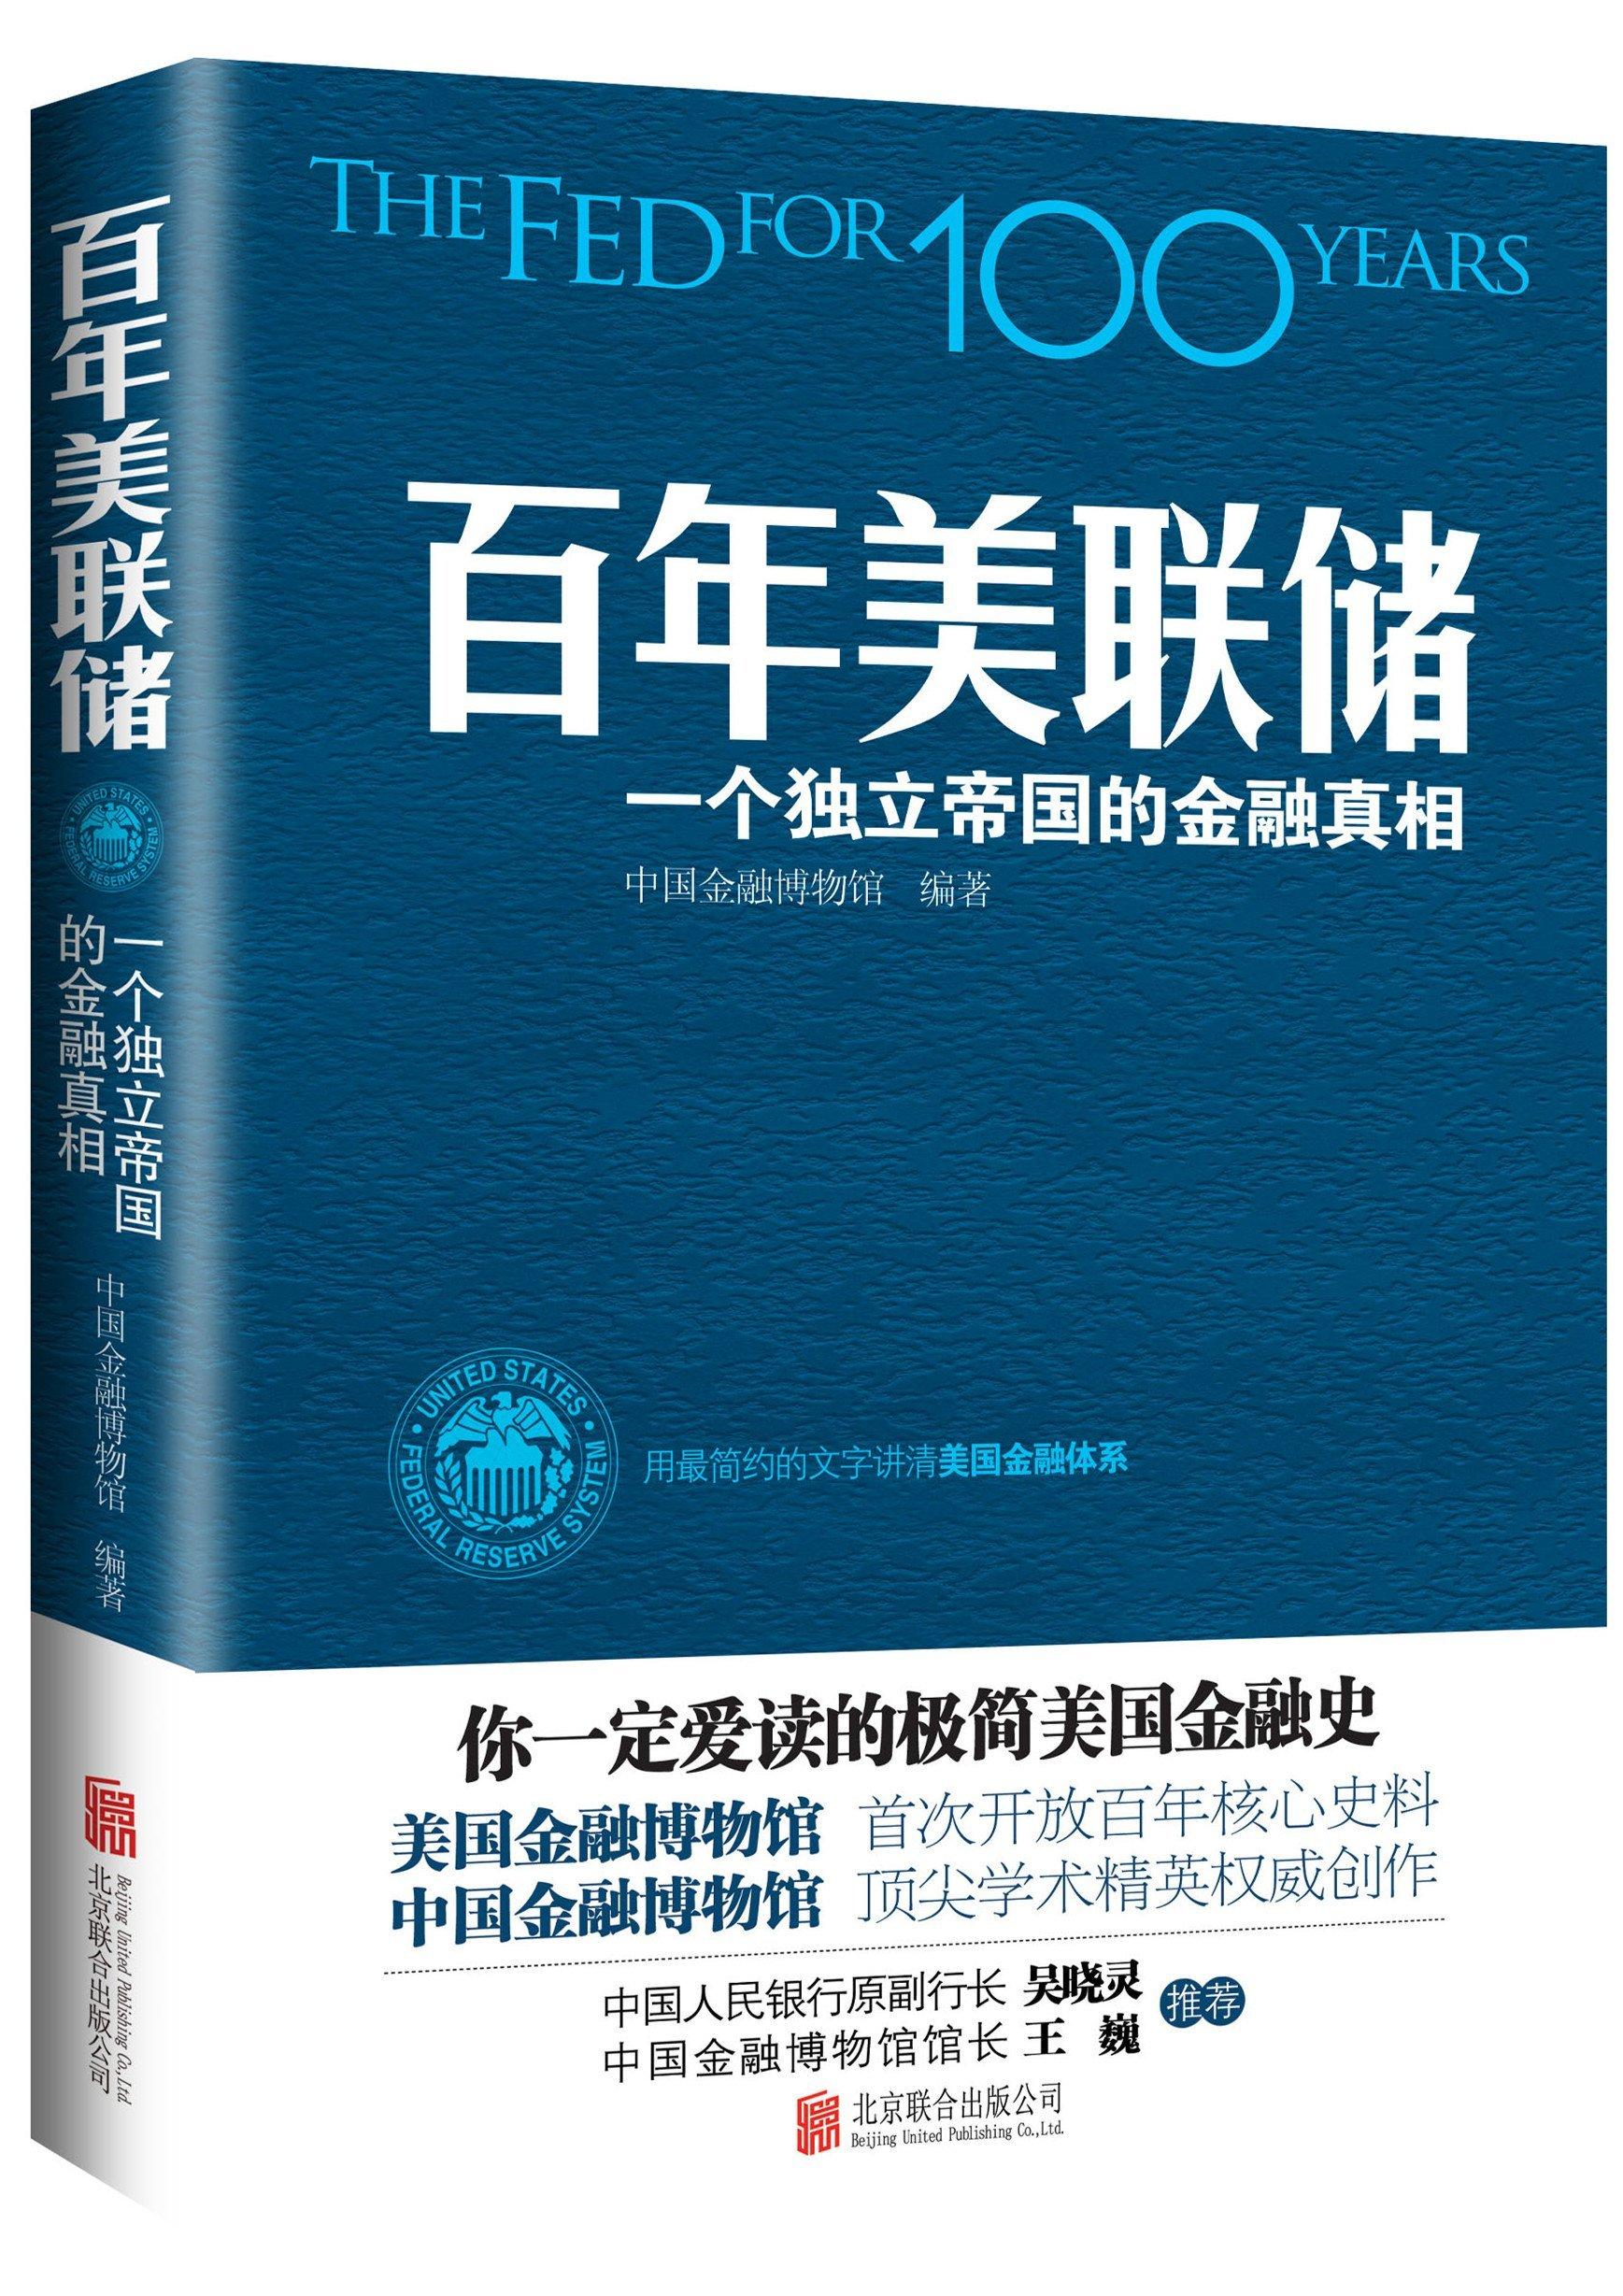 The FED for 100 Years 百年美联储:一个独立帝国的金融真相  by  China Financial Museum 中国金融博物馆